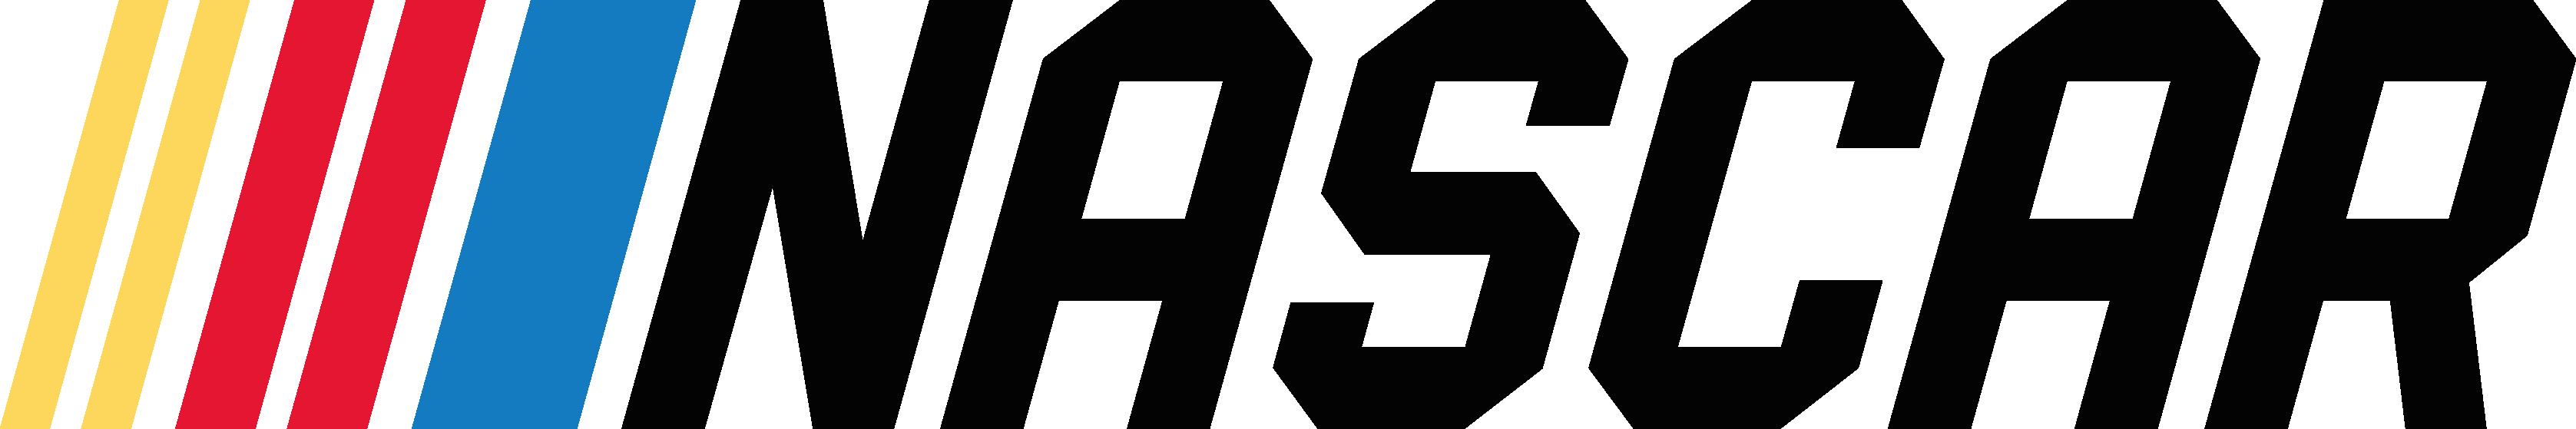 nascar logo vector eps free download logo icons clipart rh freelogovectors net nascar racing logo vector nascar vector free